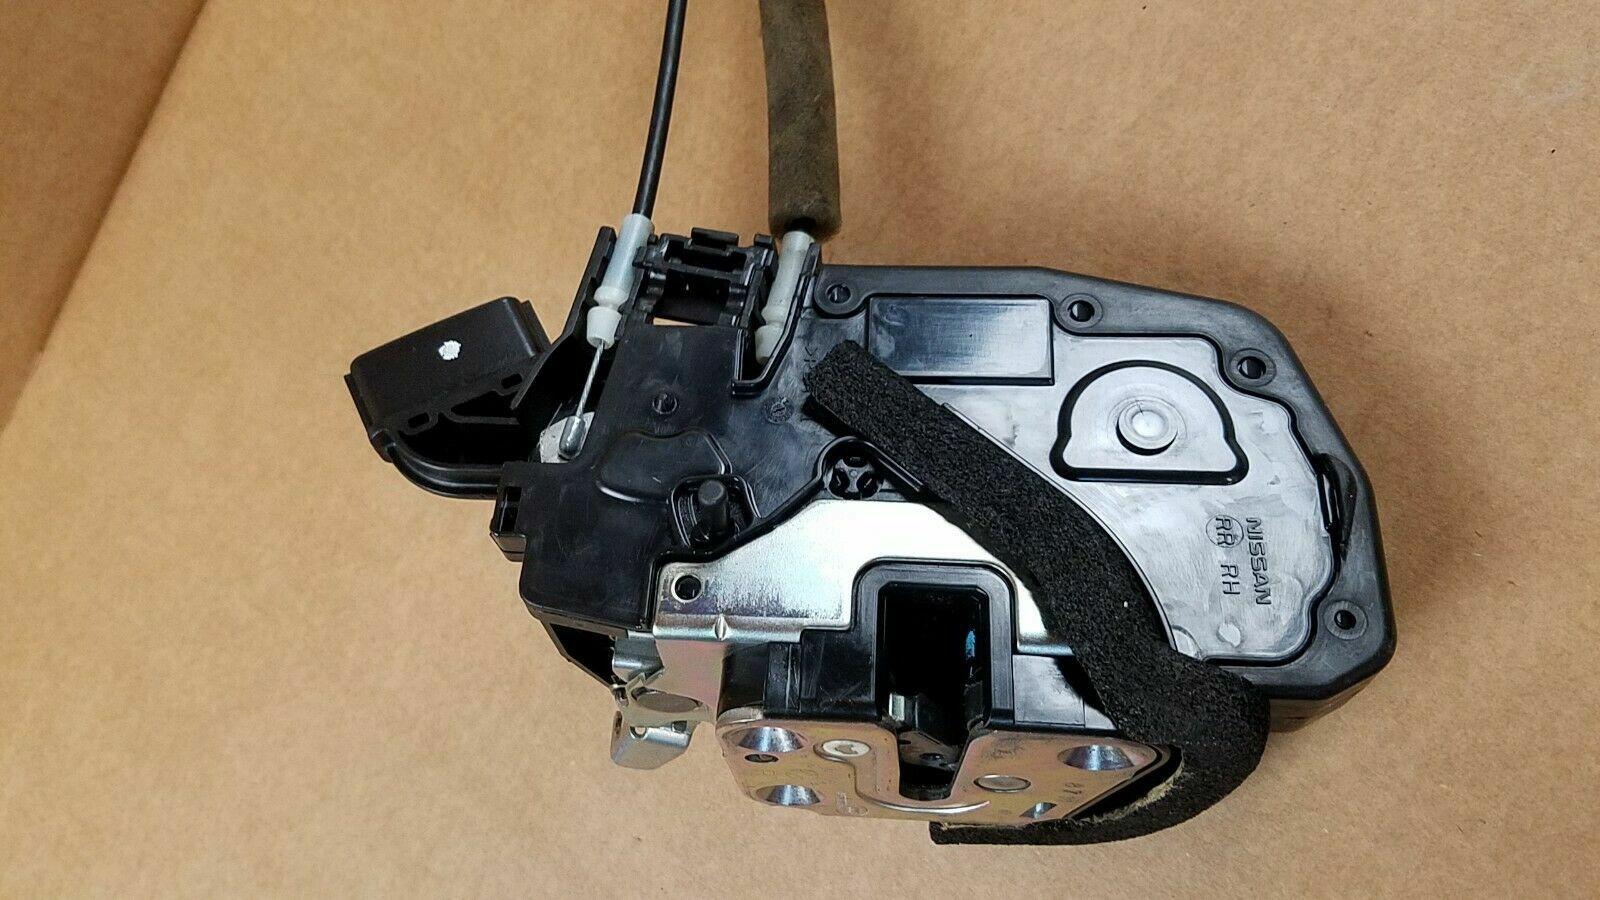 OEM 09-17 INFINITI FX35 FX50 QX70 REAR RIGHT SIDE DOOR LOCK LATCH ACTUATOR